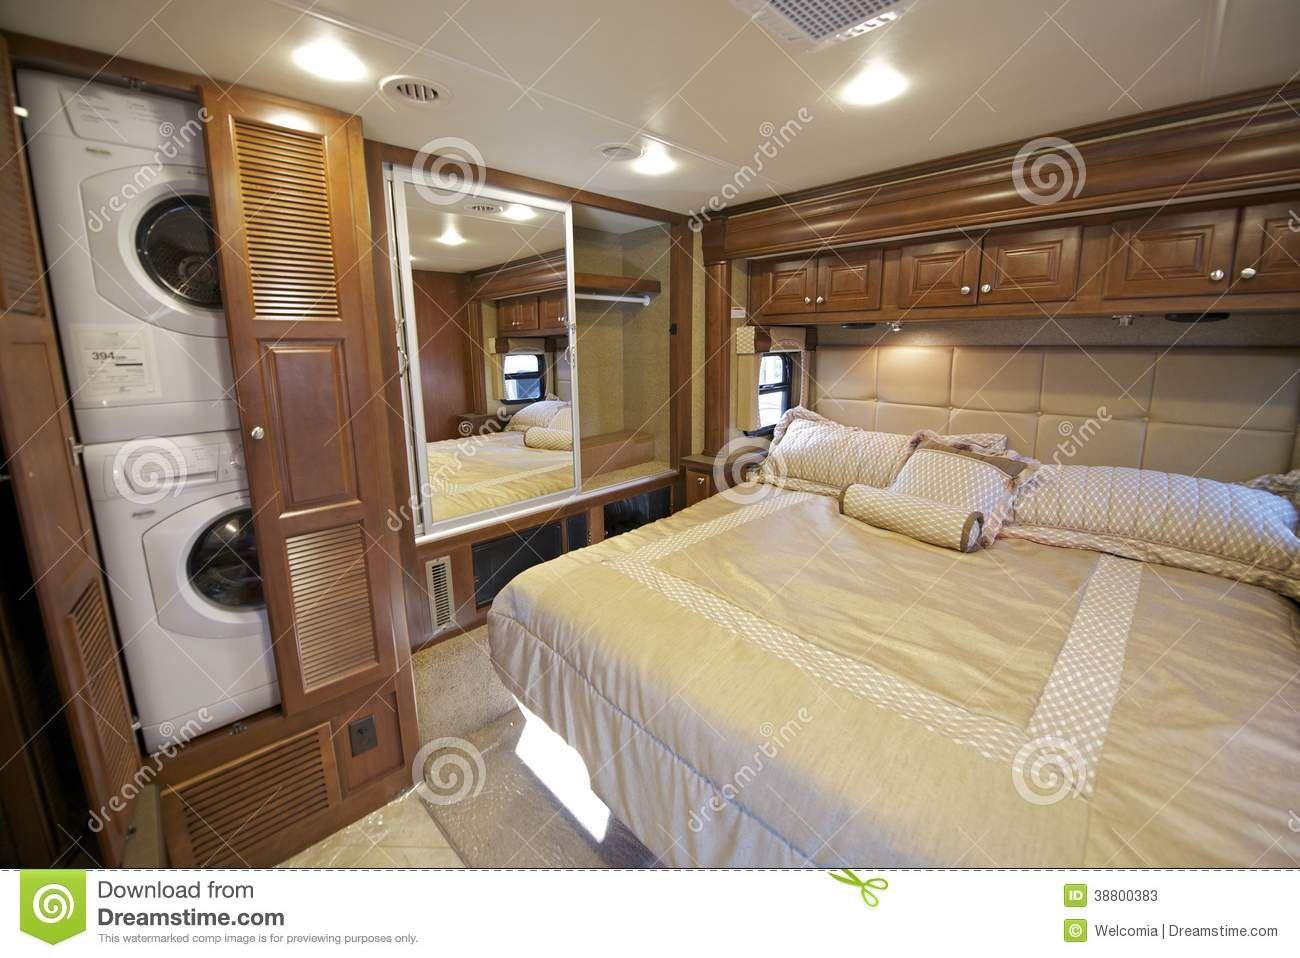 Luxury RV Interiors Bedrooms, Rv Bedroom Recreation Vehicle .